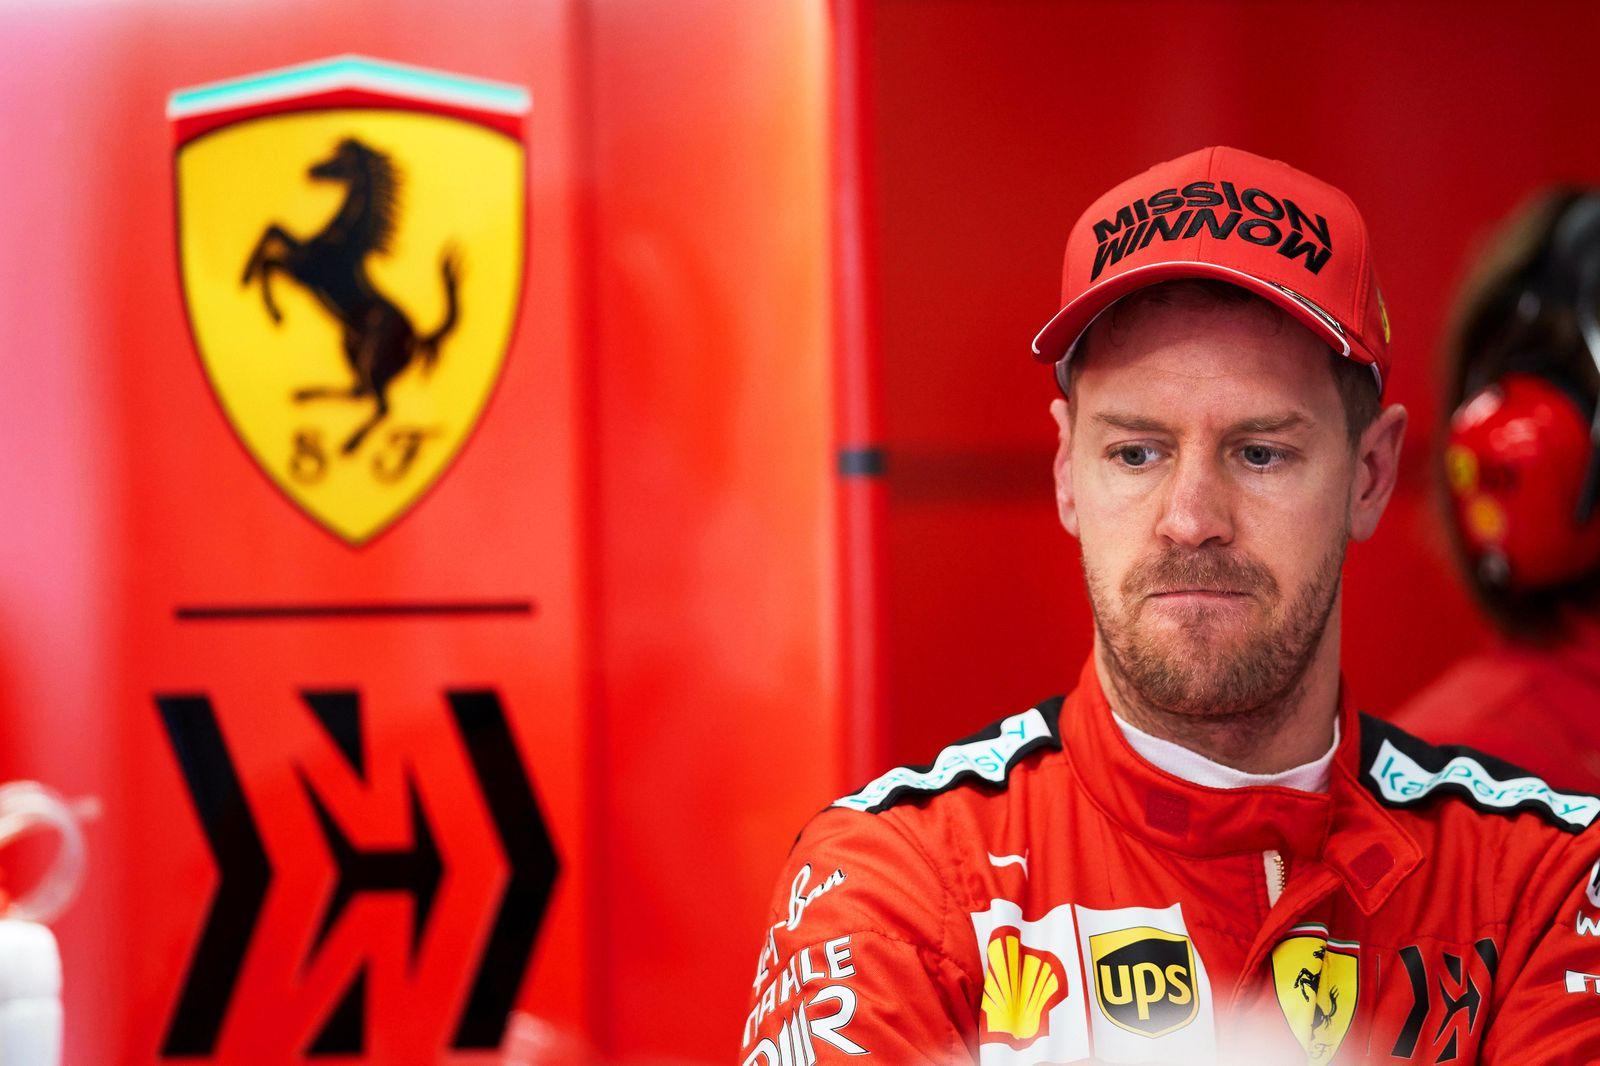 German Formula One driver Sebastian Vettel of Scuderia Ferrari to leave team Ferrari after 2020 season, Barcelona, Spain - 27 Feb 2020